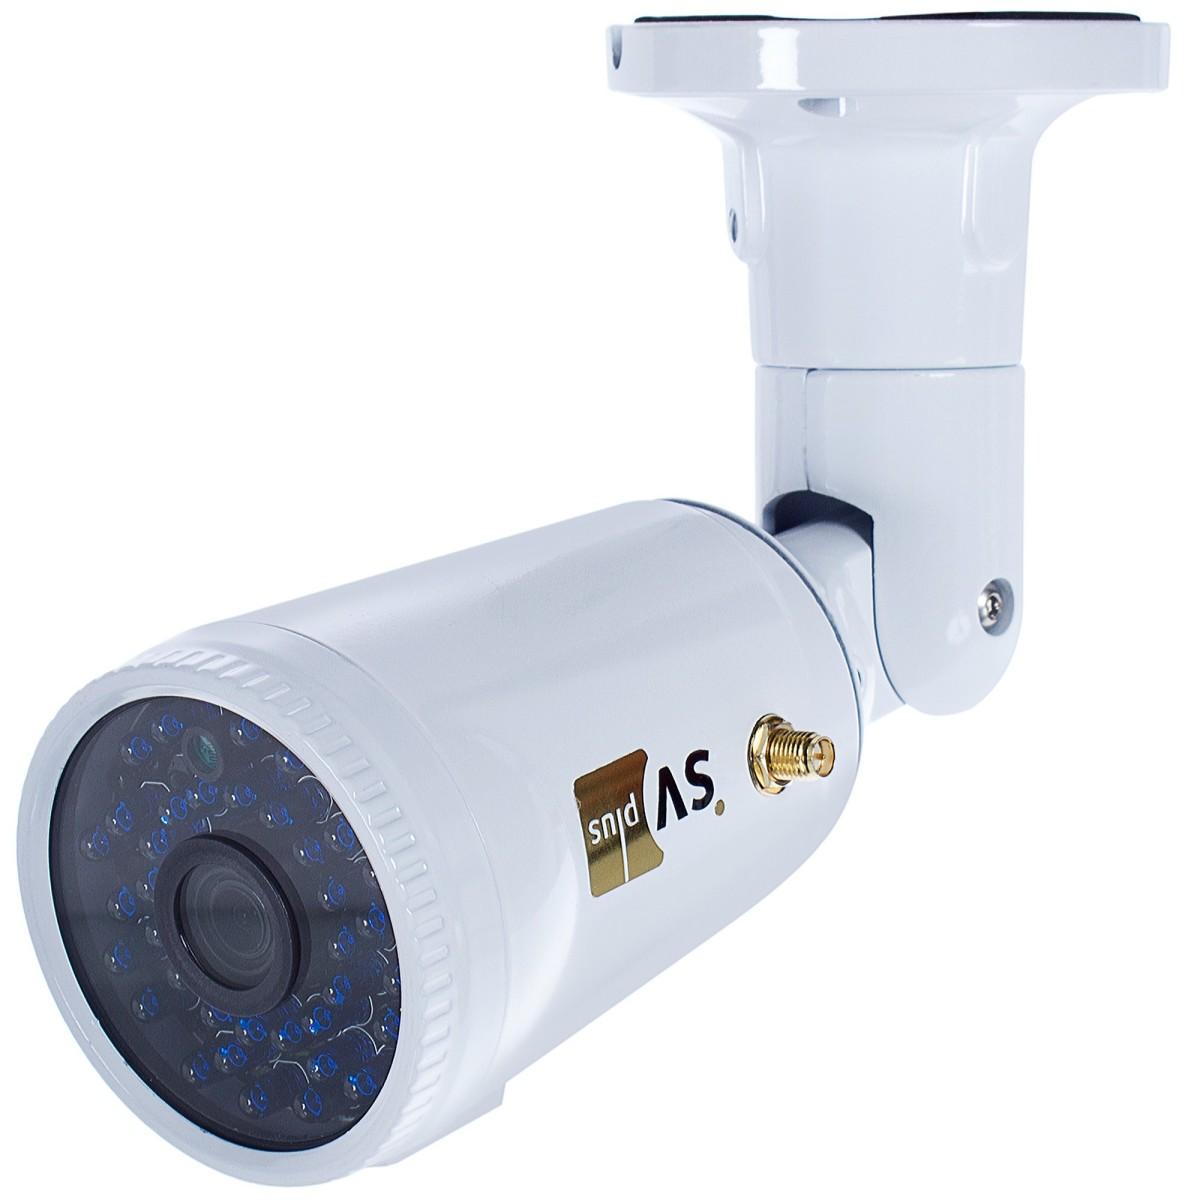 IP Камера уличная SVIP-432W с WiFi  Full HD